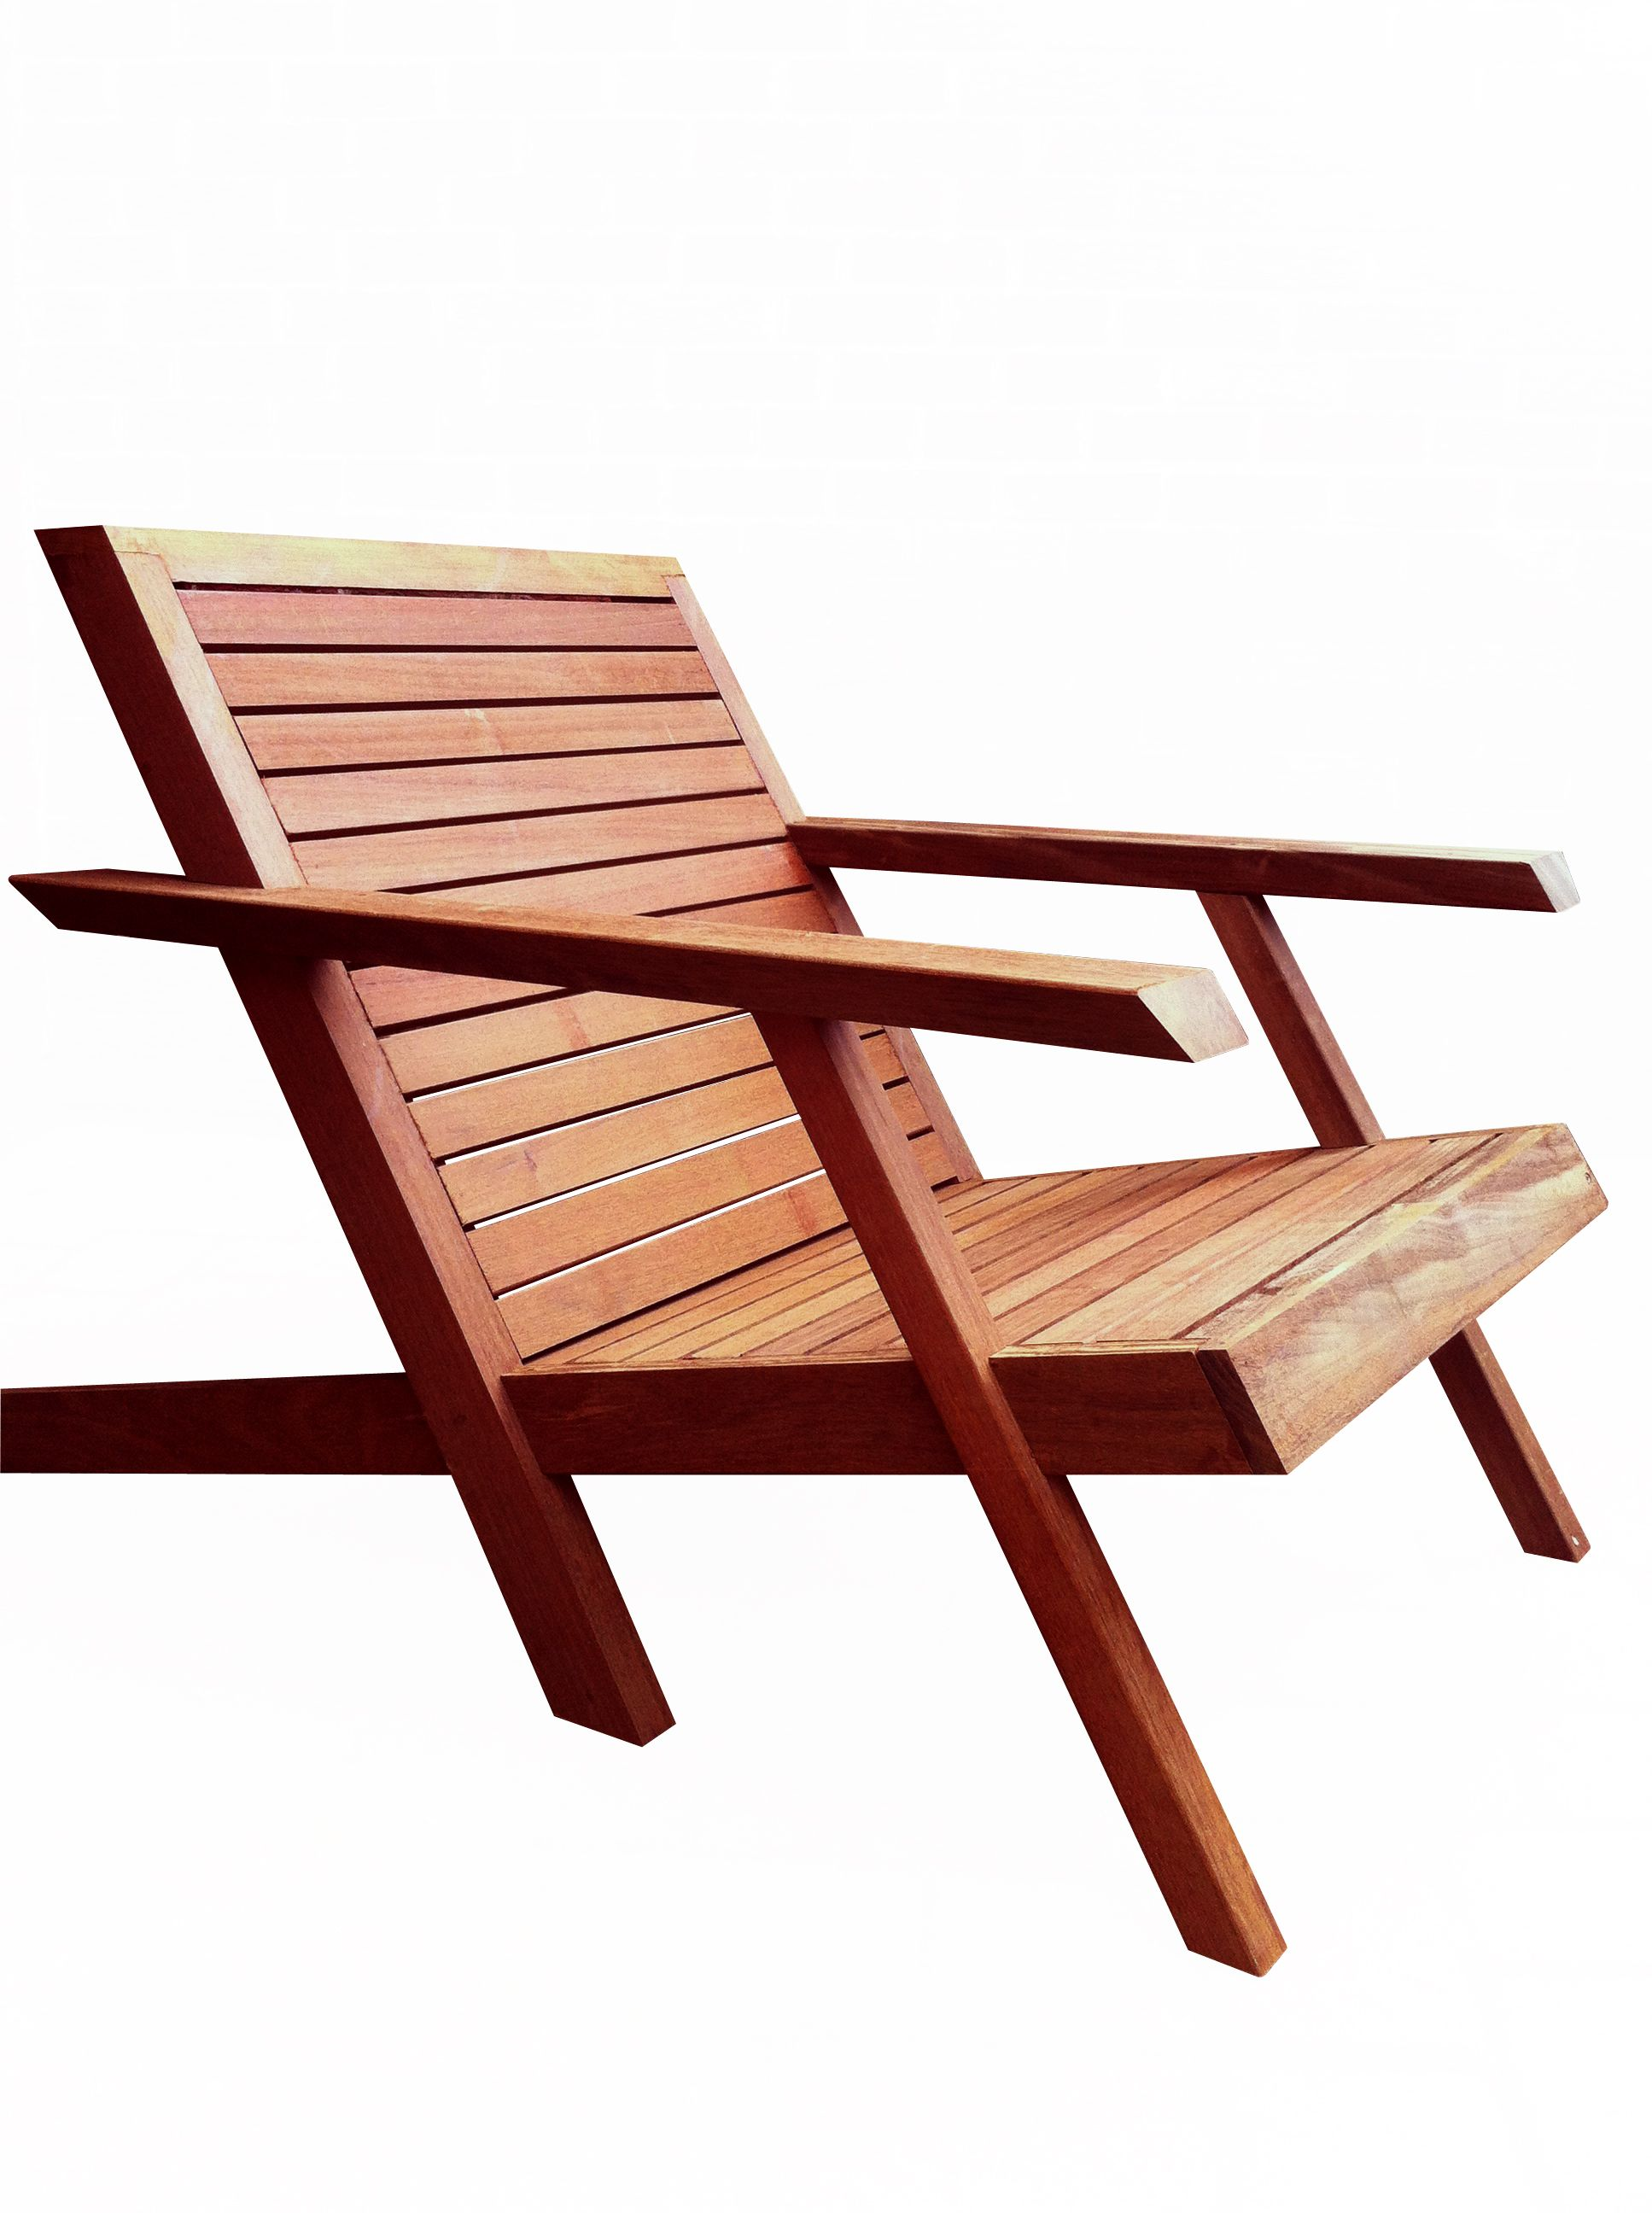 modern style adirondack chairs at costco chair endgrainfurniture endgrain